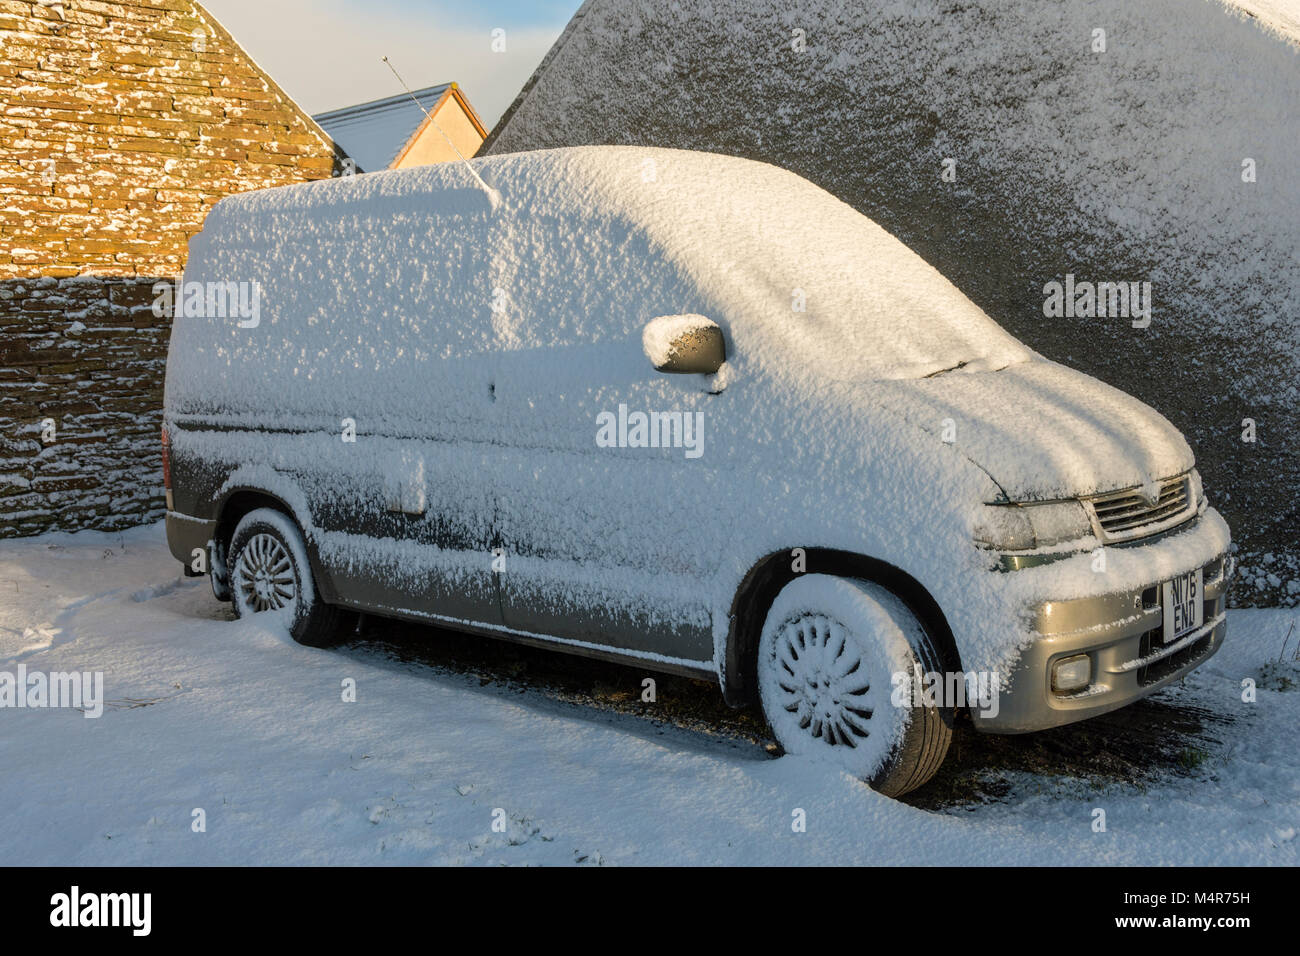 A Mazda Bongo motor vehicle plastered with snow at the village of Mey, Caithness, Scotland, UK. - Stock Image